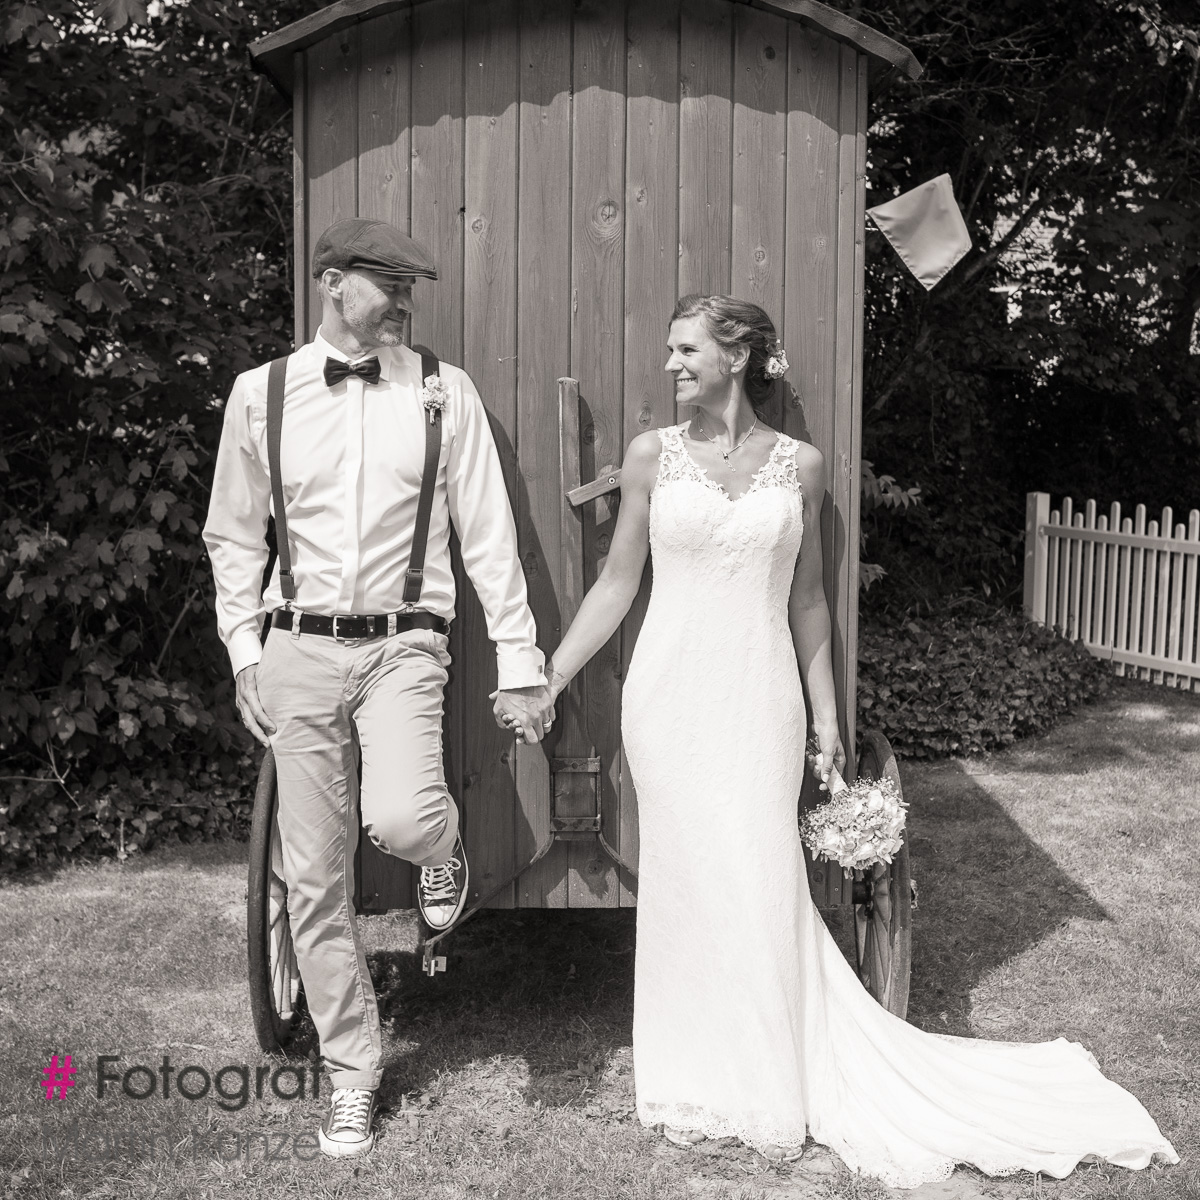 Hochzeitsfoto Standesamt Museum SPO - Fotograf Martin Kunze